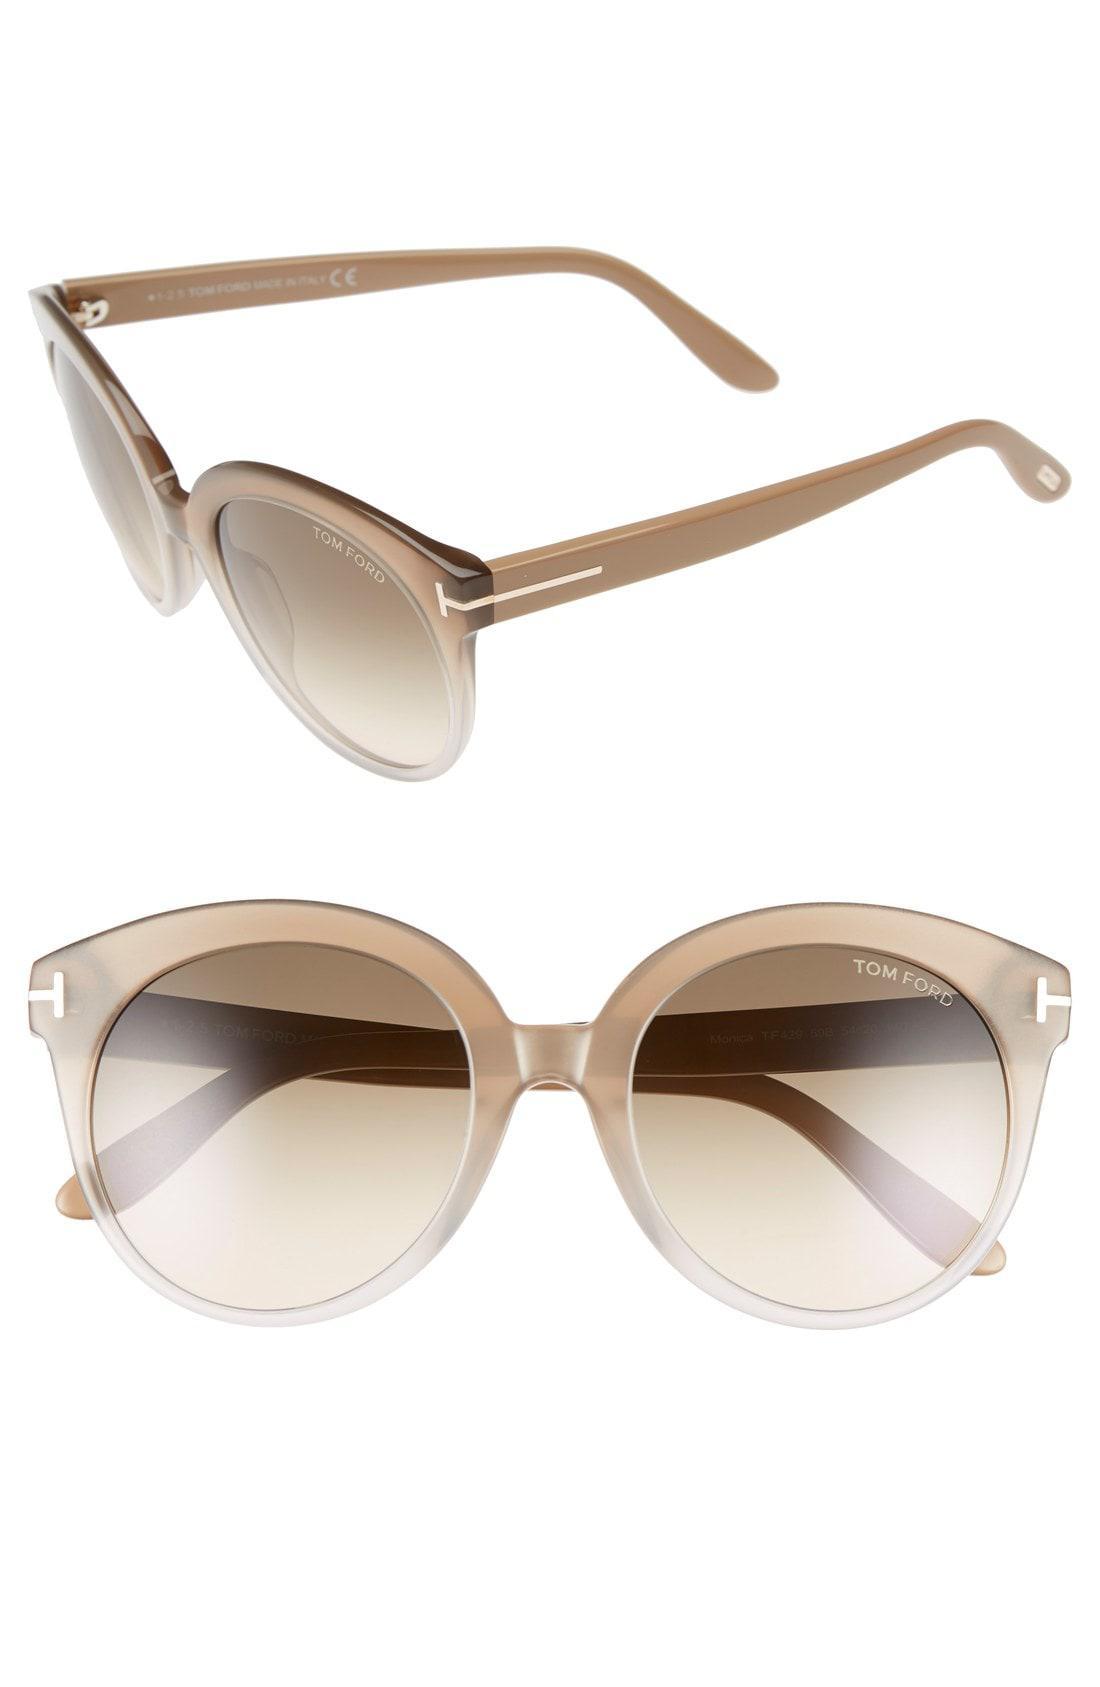 aa409db51d6c Lyst - Tom Ford  monica  54mm Retro Sunglasses - in Brown